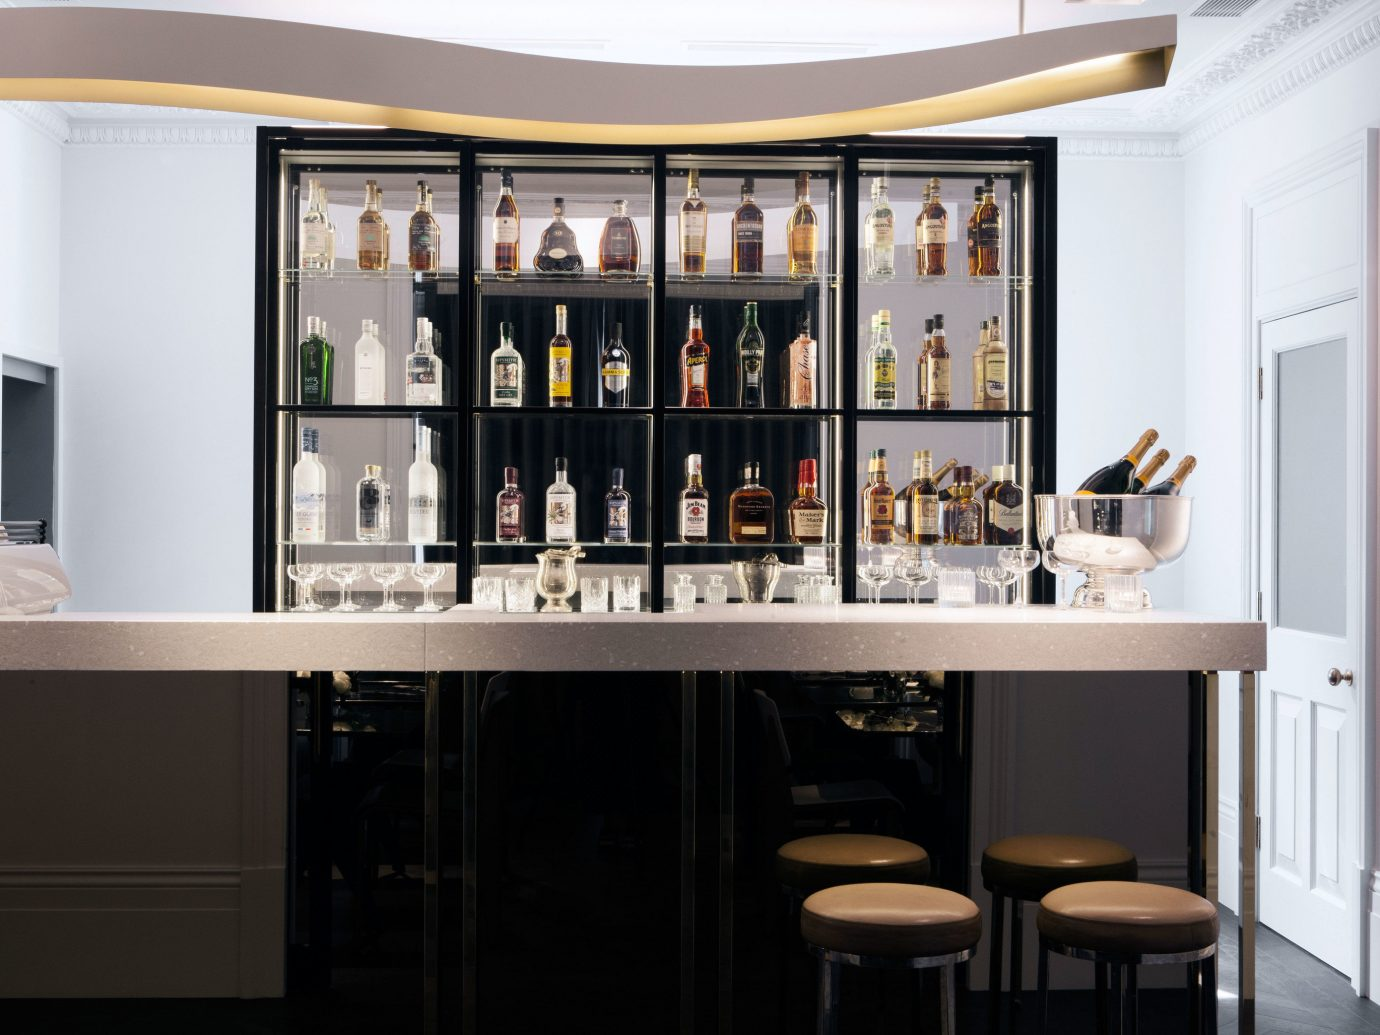 Boutique Hotels Hotels indoor wall room property dining room cabinetry home Kitchen interior design living room Design estate furniture